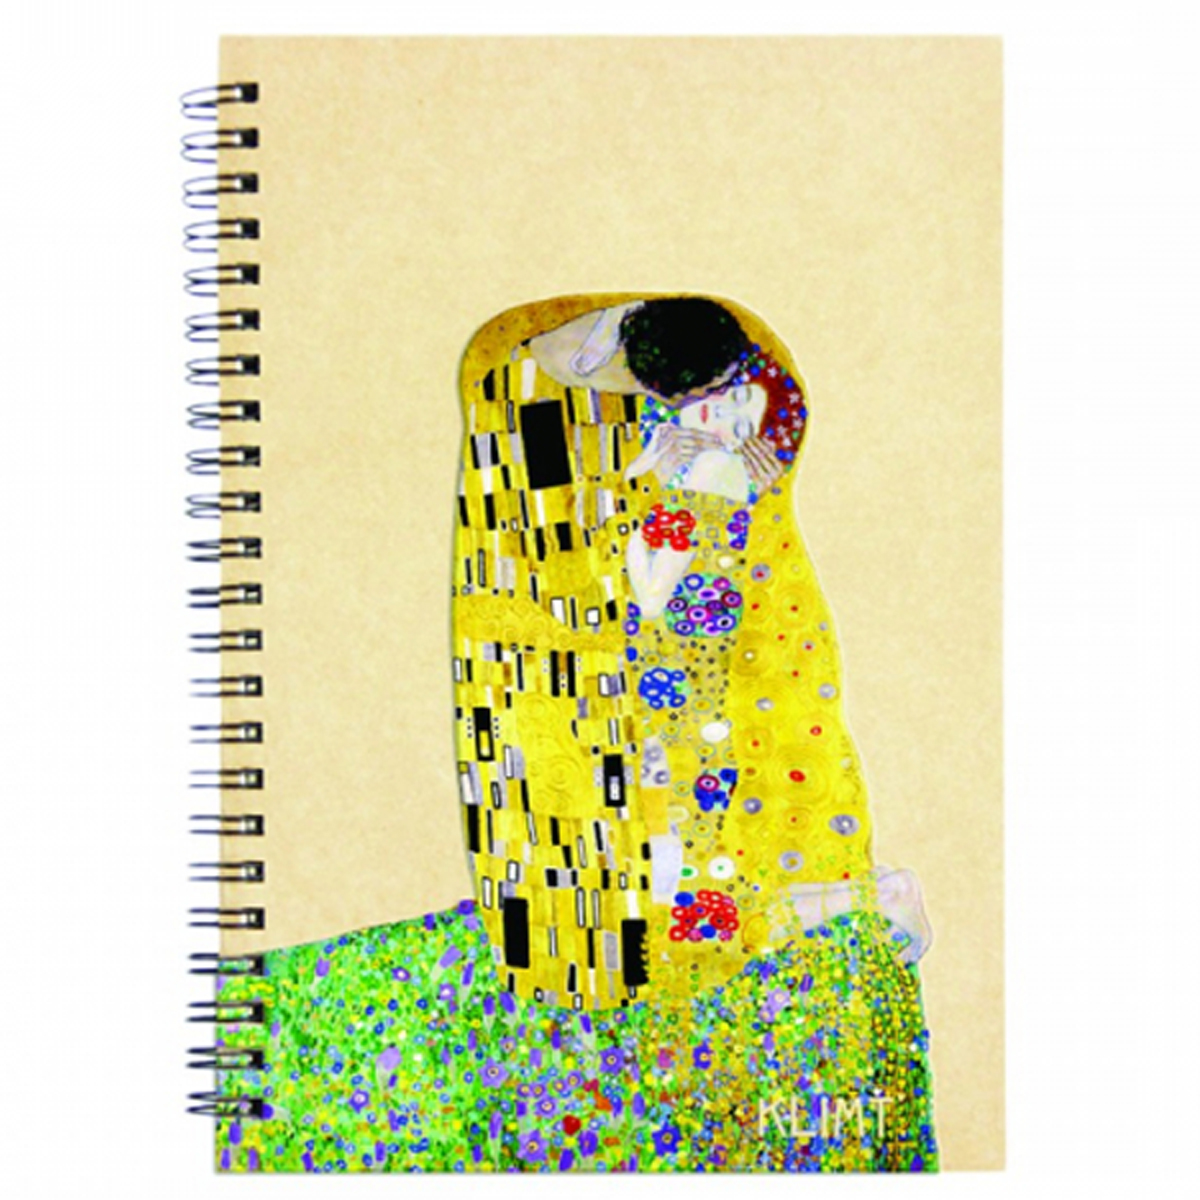 Carnet à spirale \'Gustav Klimt\' (Le Baiser) - 18x13 cm - [R2007]